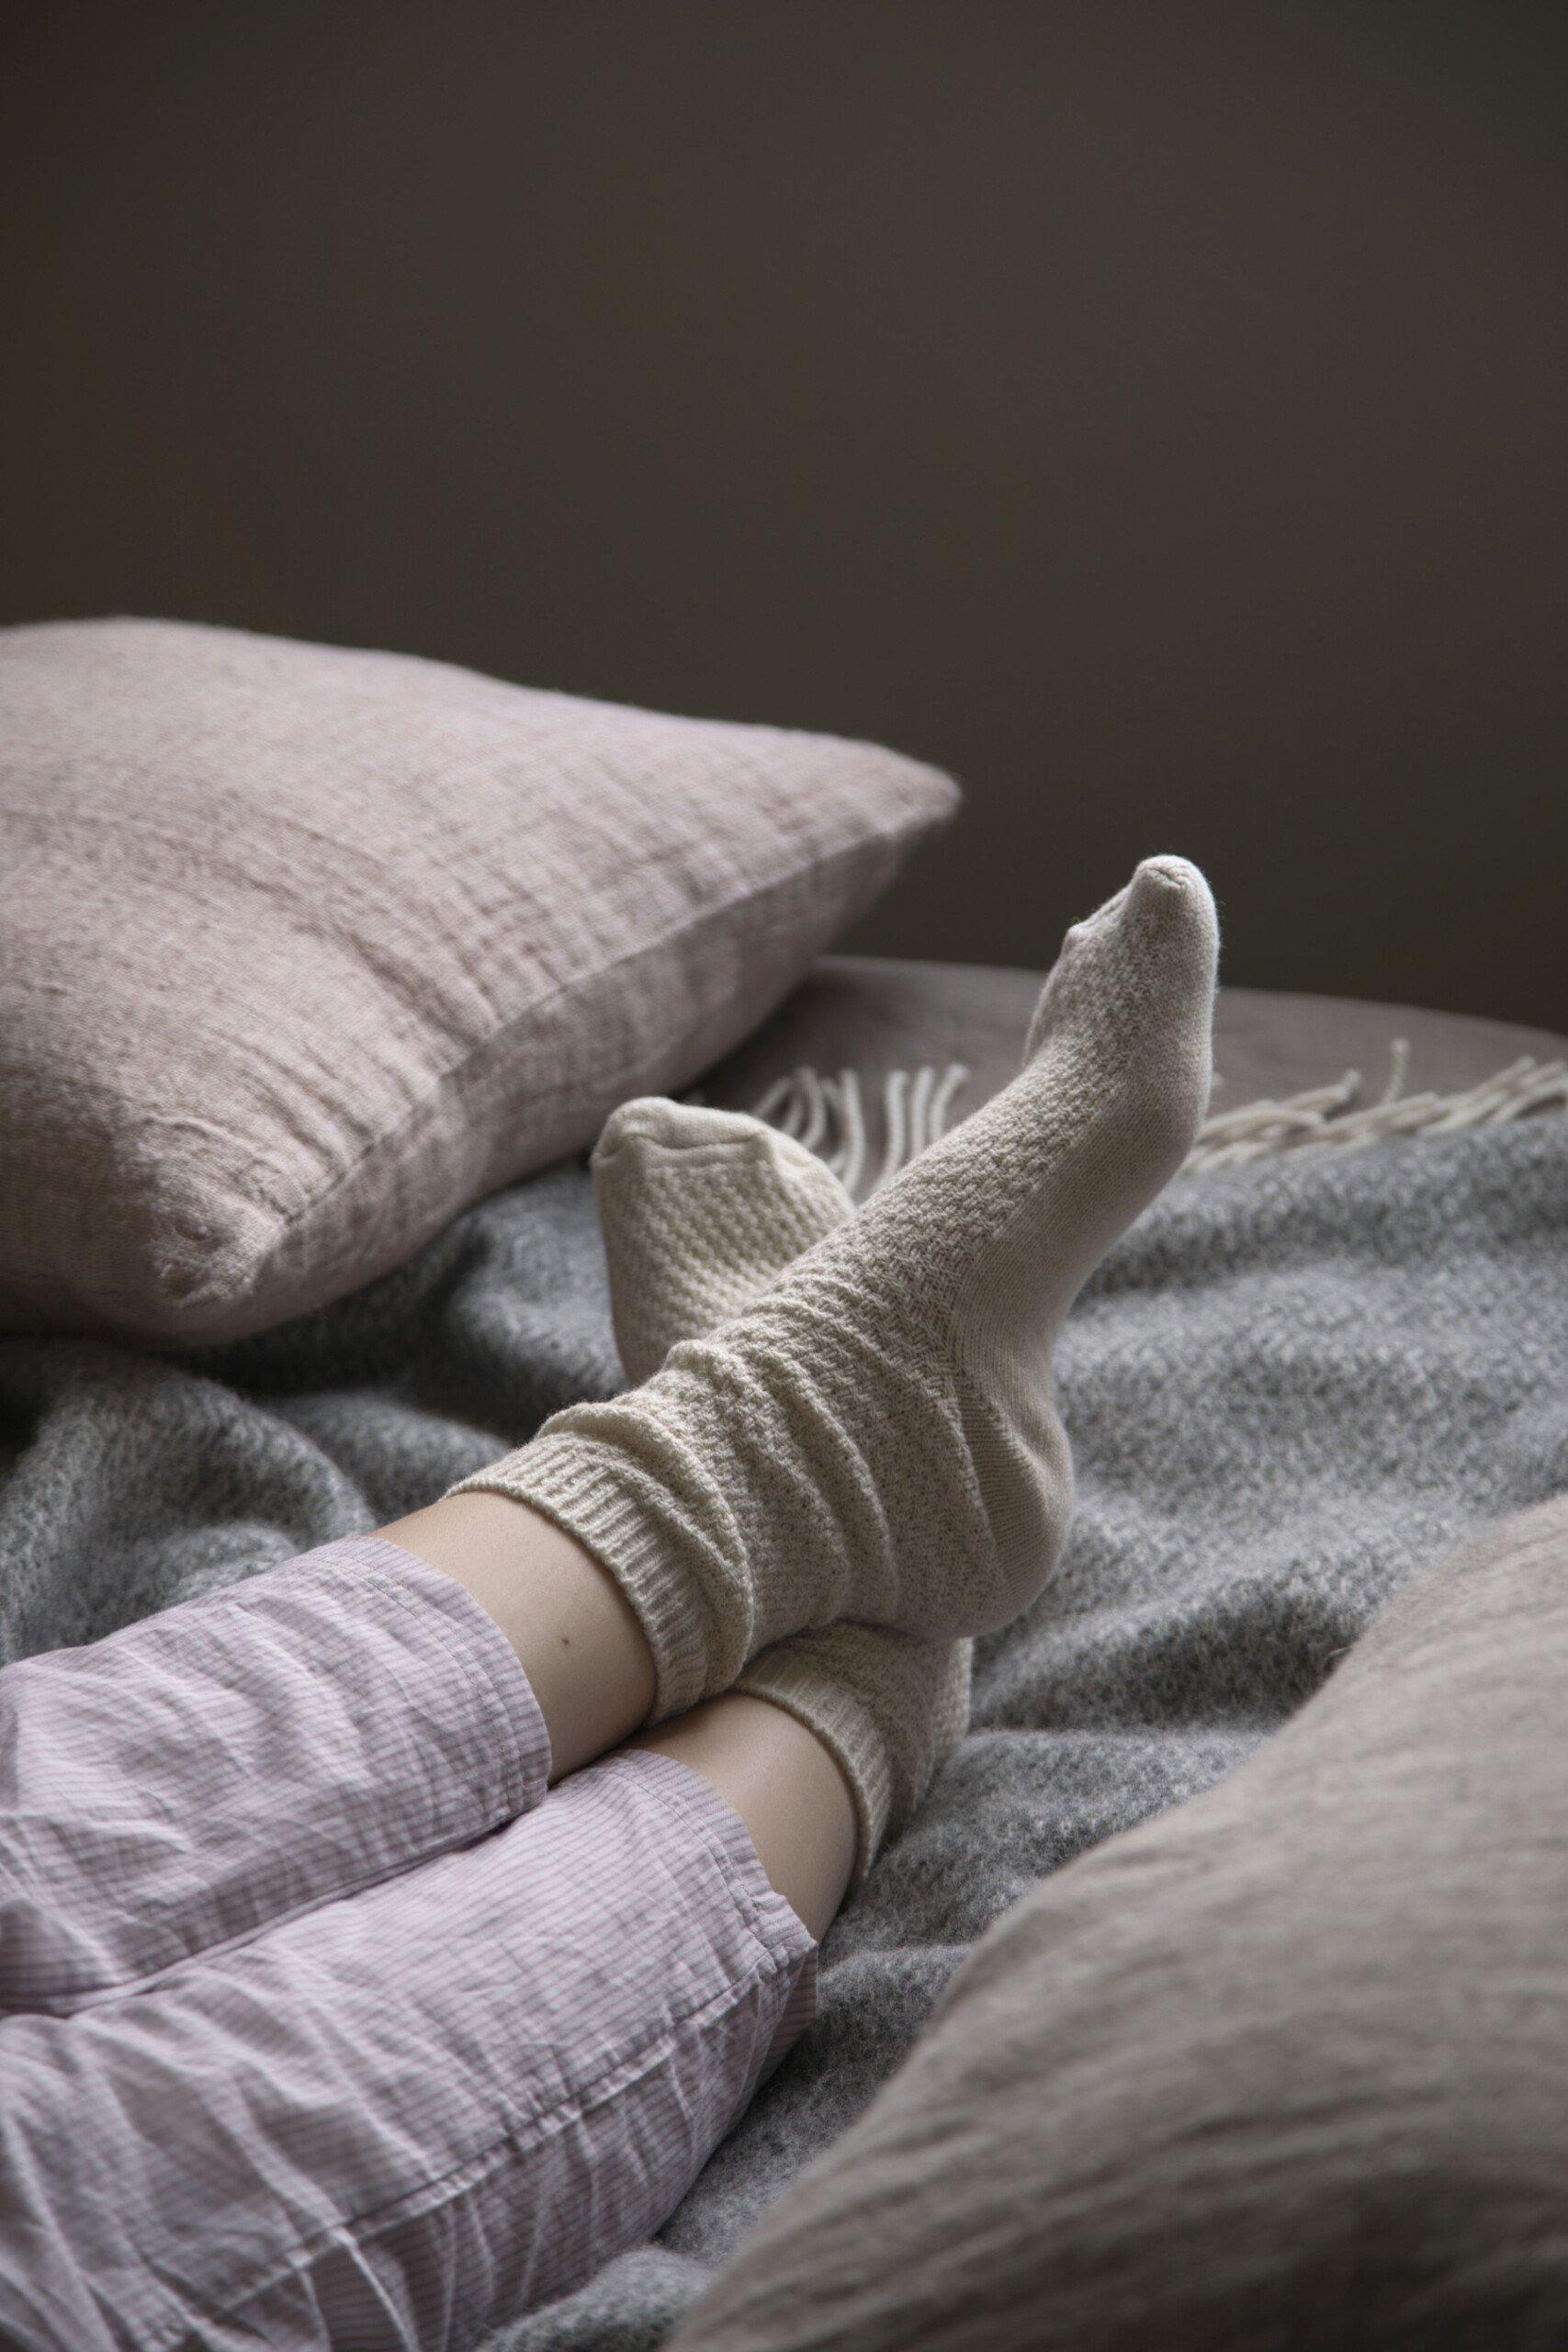 SostreneGrene hygge moment socks cozy scaled